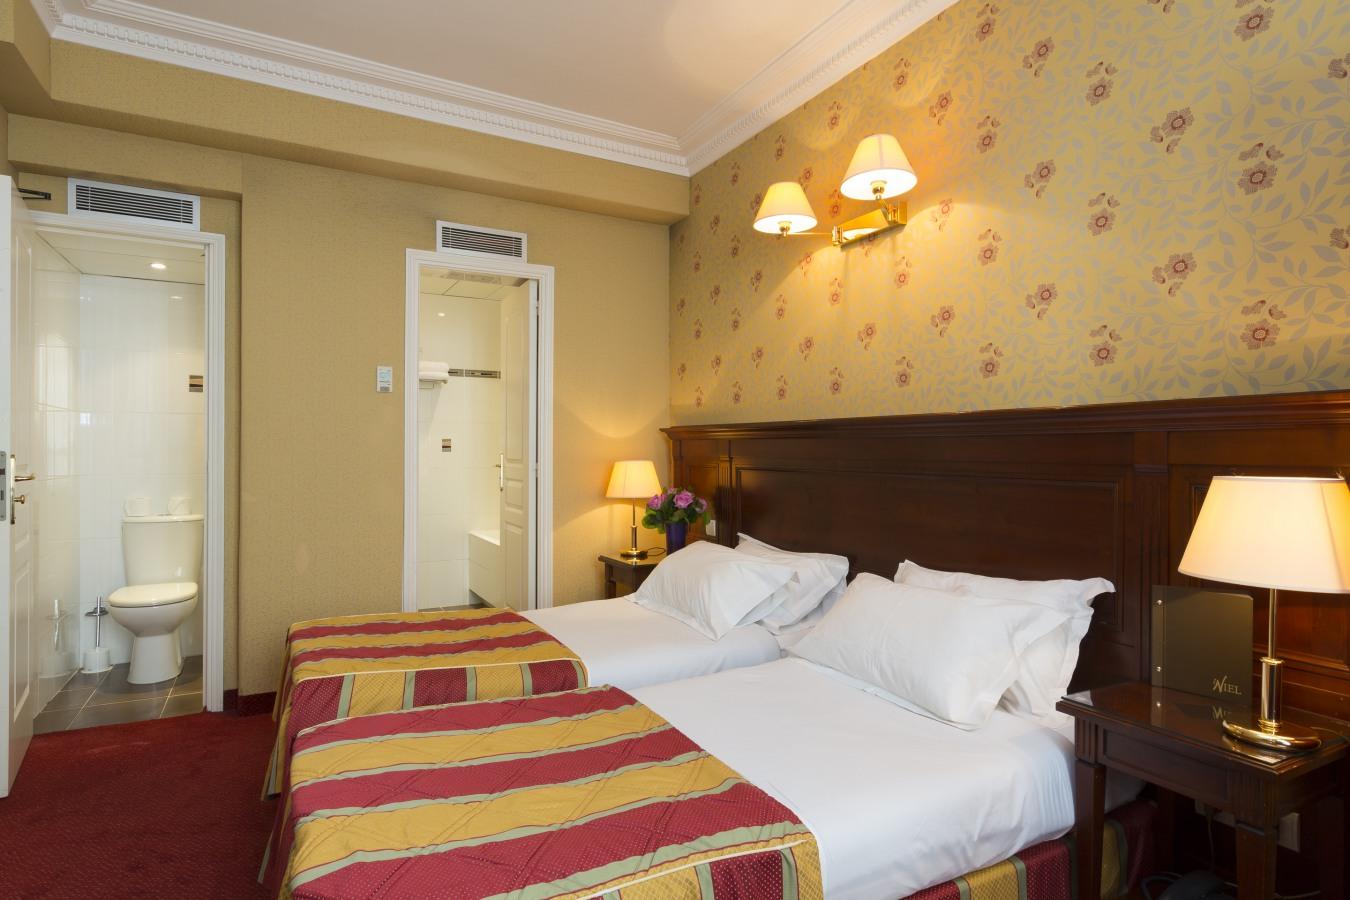 Hôtel Niel - 客室